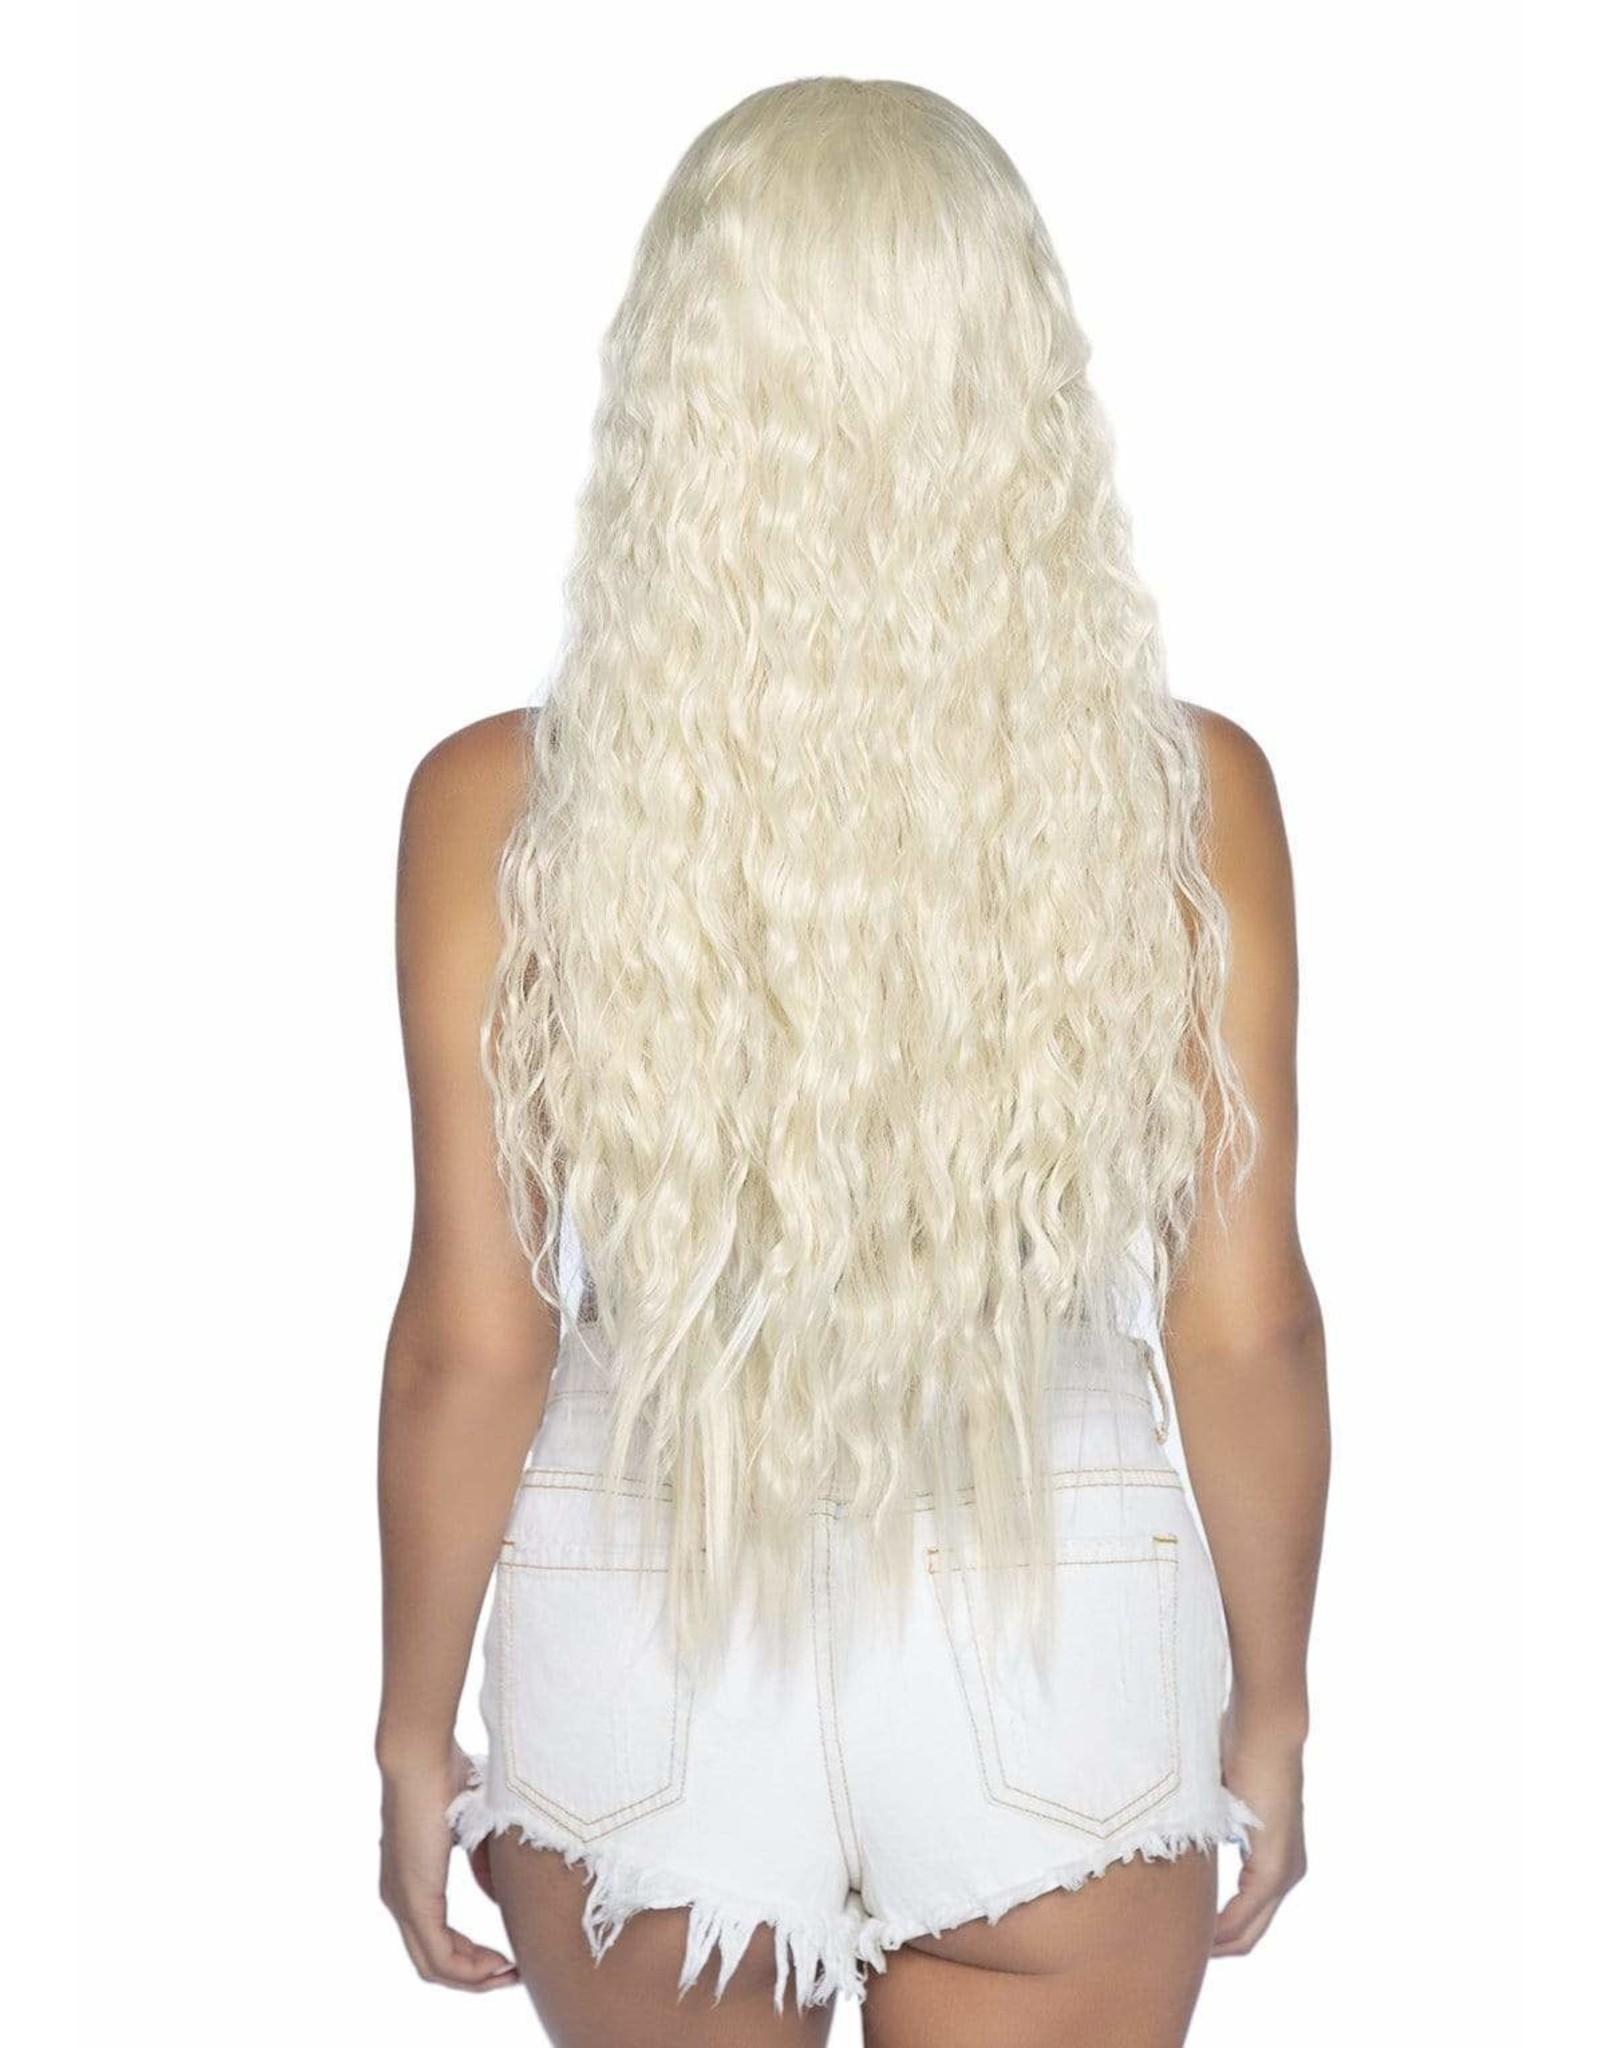 "LEG AVENUE 29"" BEACHY WAVE LONG HAIR WIG BLONDE"